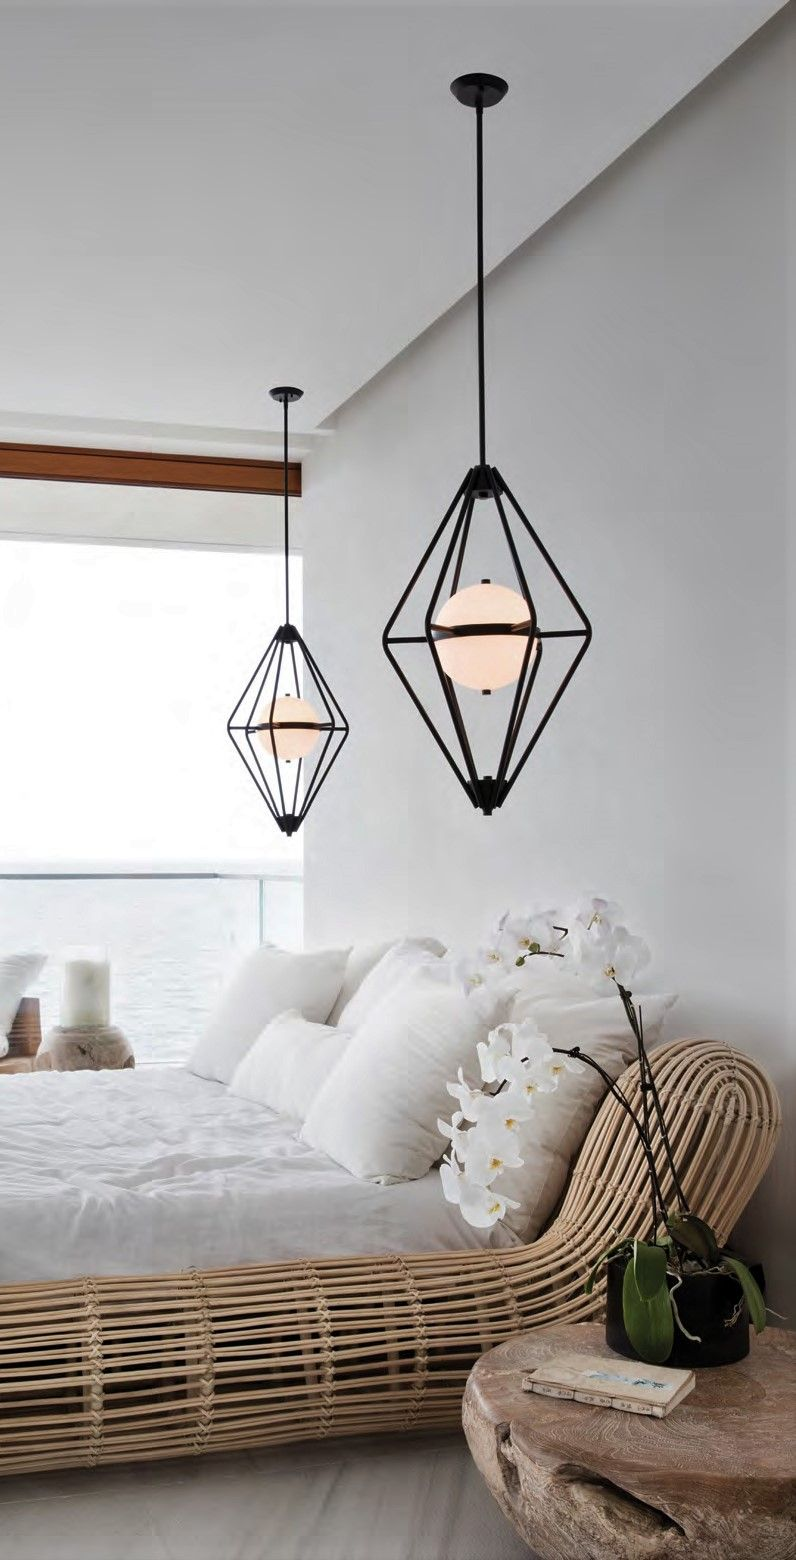 rustic bedroom light fixtures on modern bedroom pendant inspiration and ideas bedroom reading lights bedroom lighting bedroom pendant modern bedroom pendant inspiration and